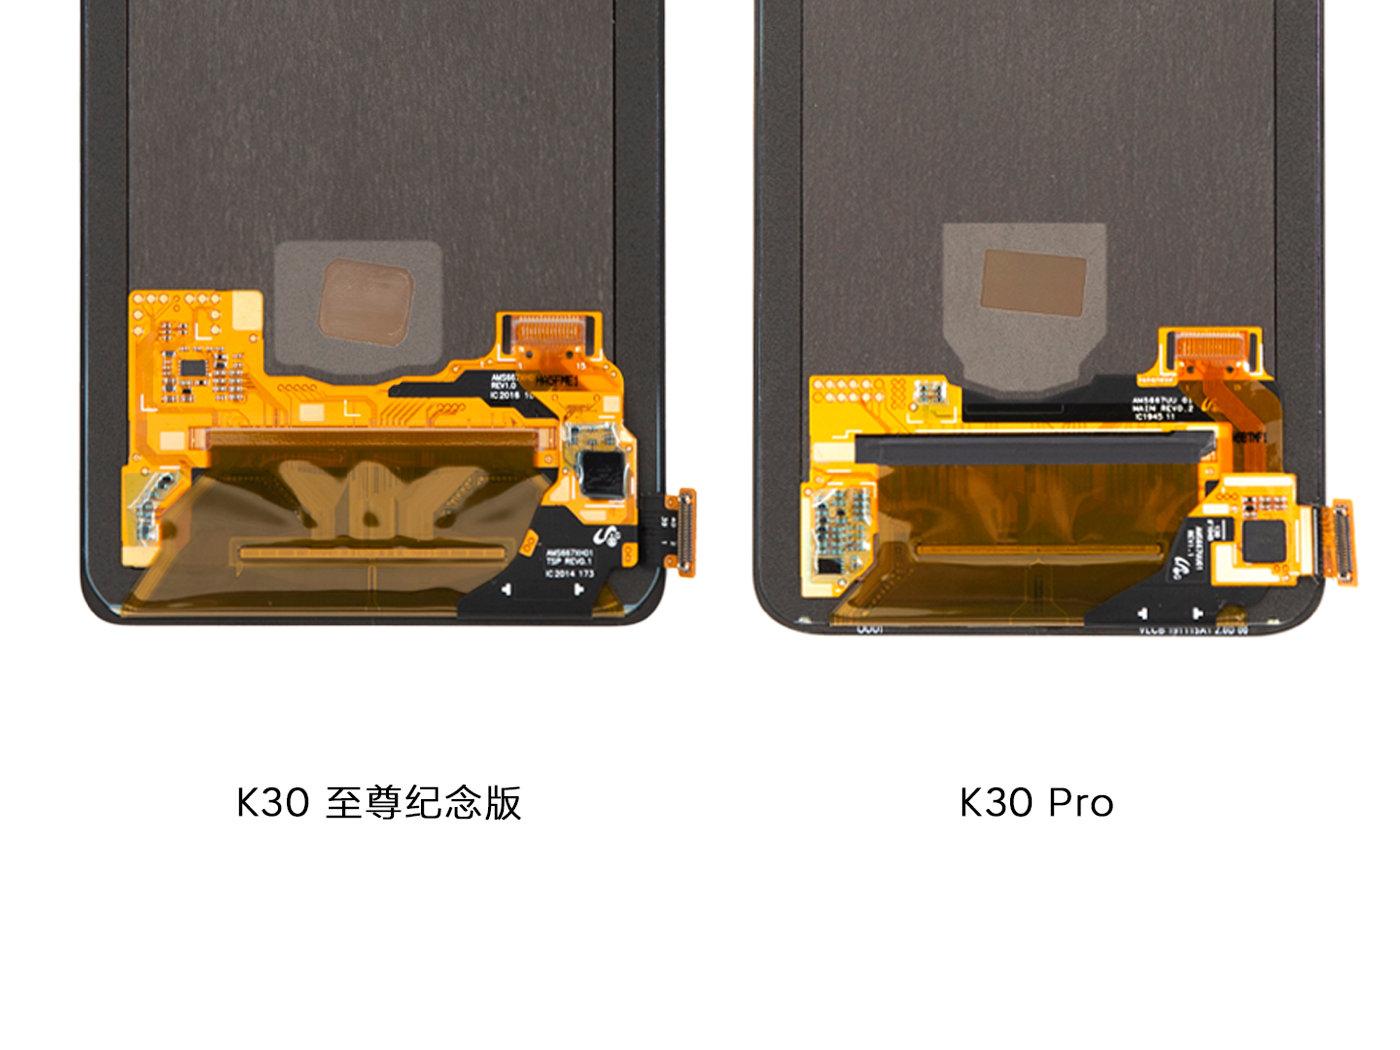 K30至尊纪念版和K30Pro有什么区别,官方来给你答案!